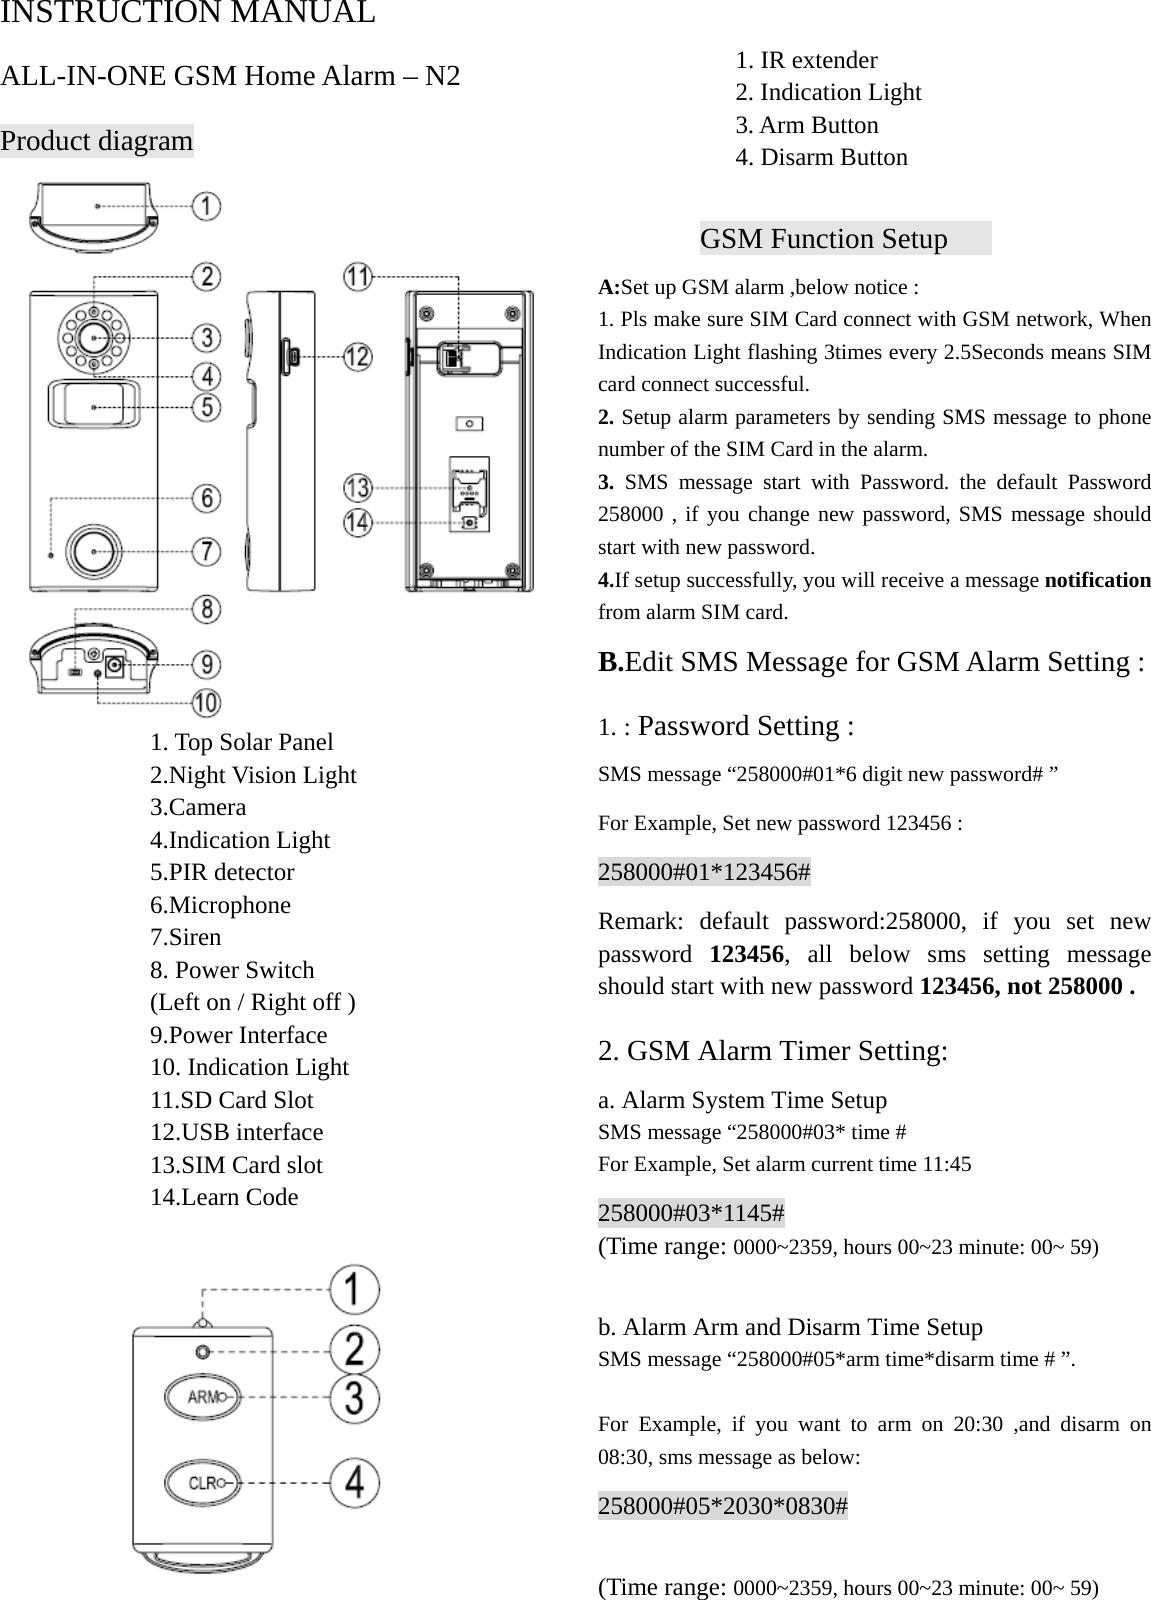 Sinopine Technology N2 Gsm Camera Alarm Security System User Manual Code 3 Siren Wiring Diagram